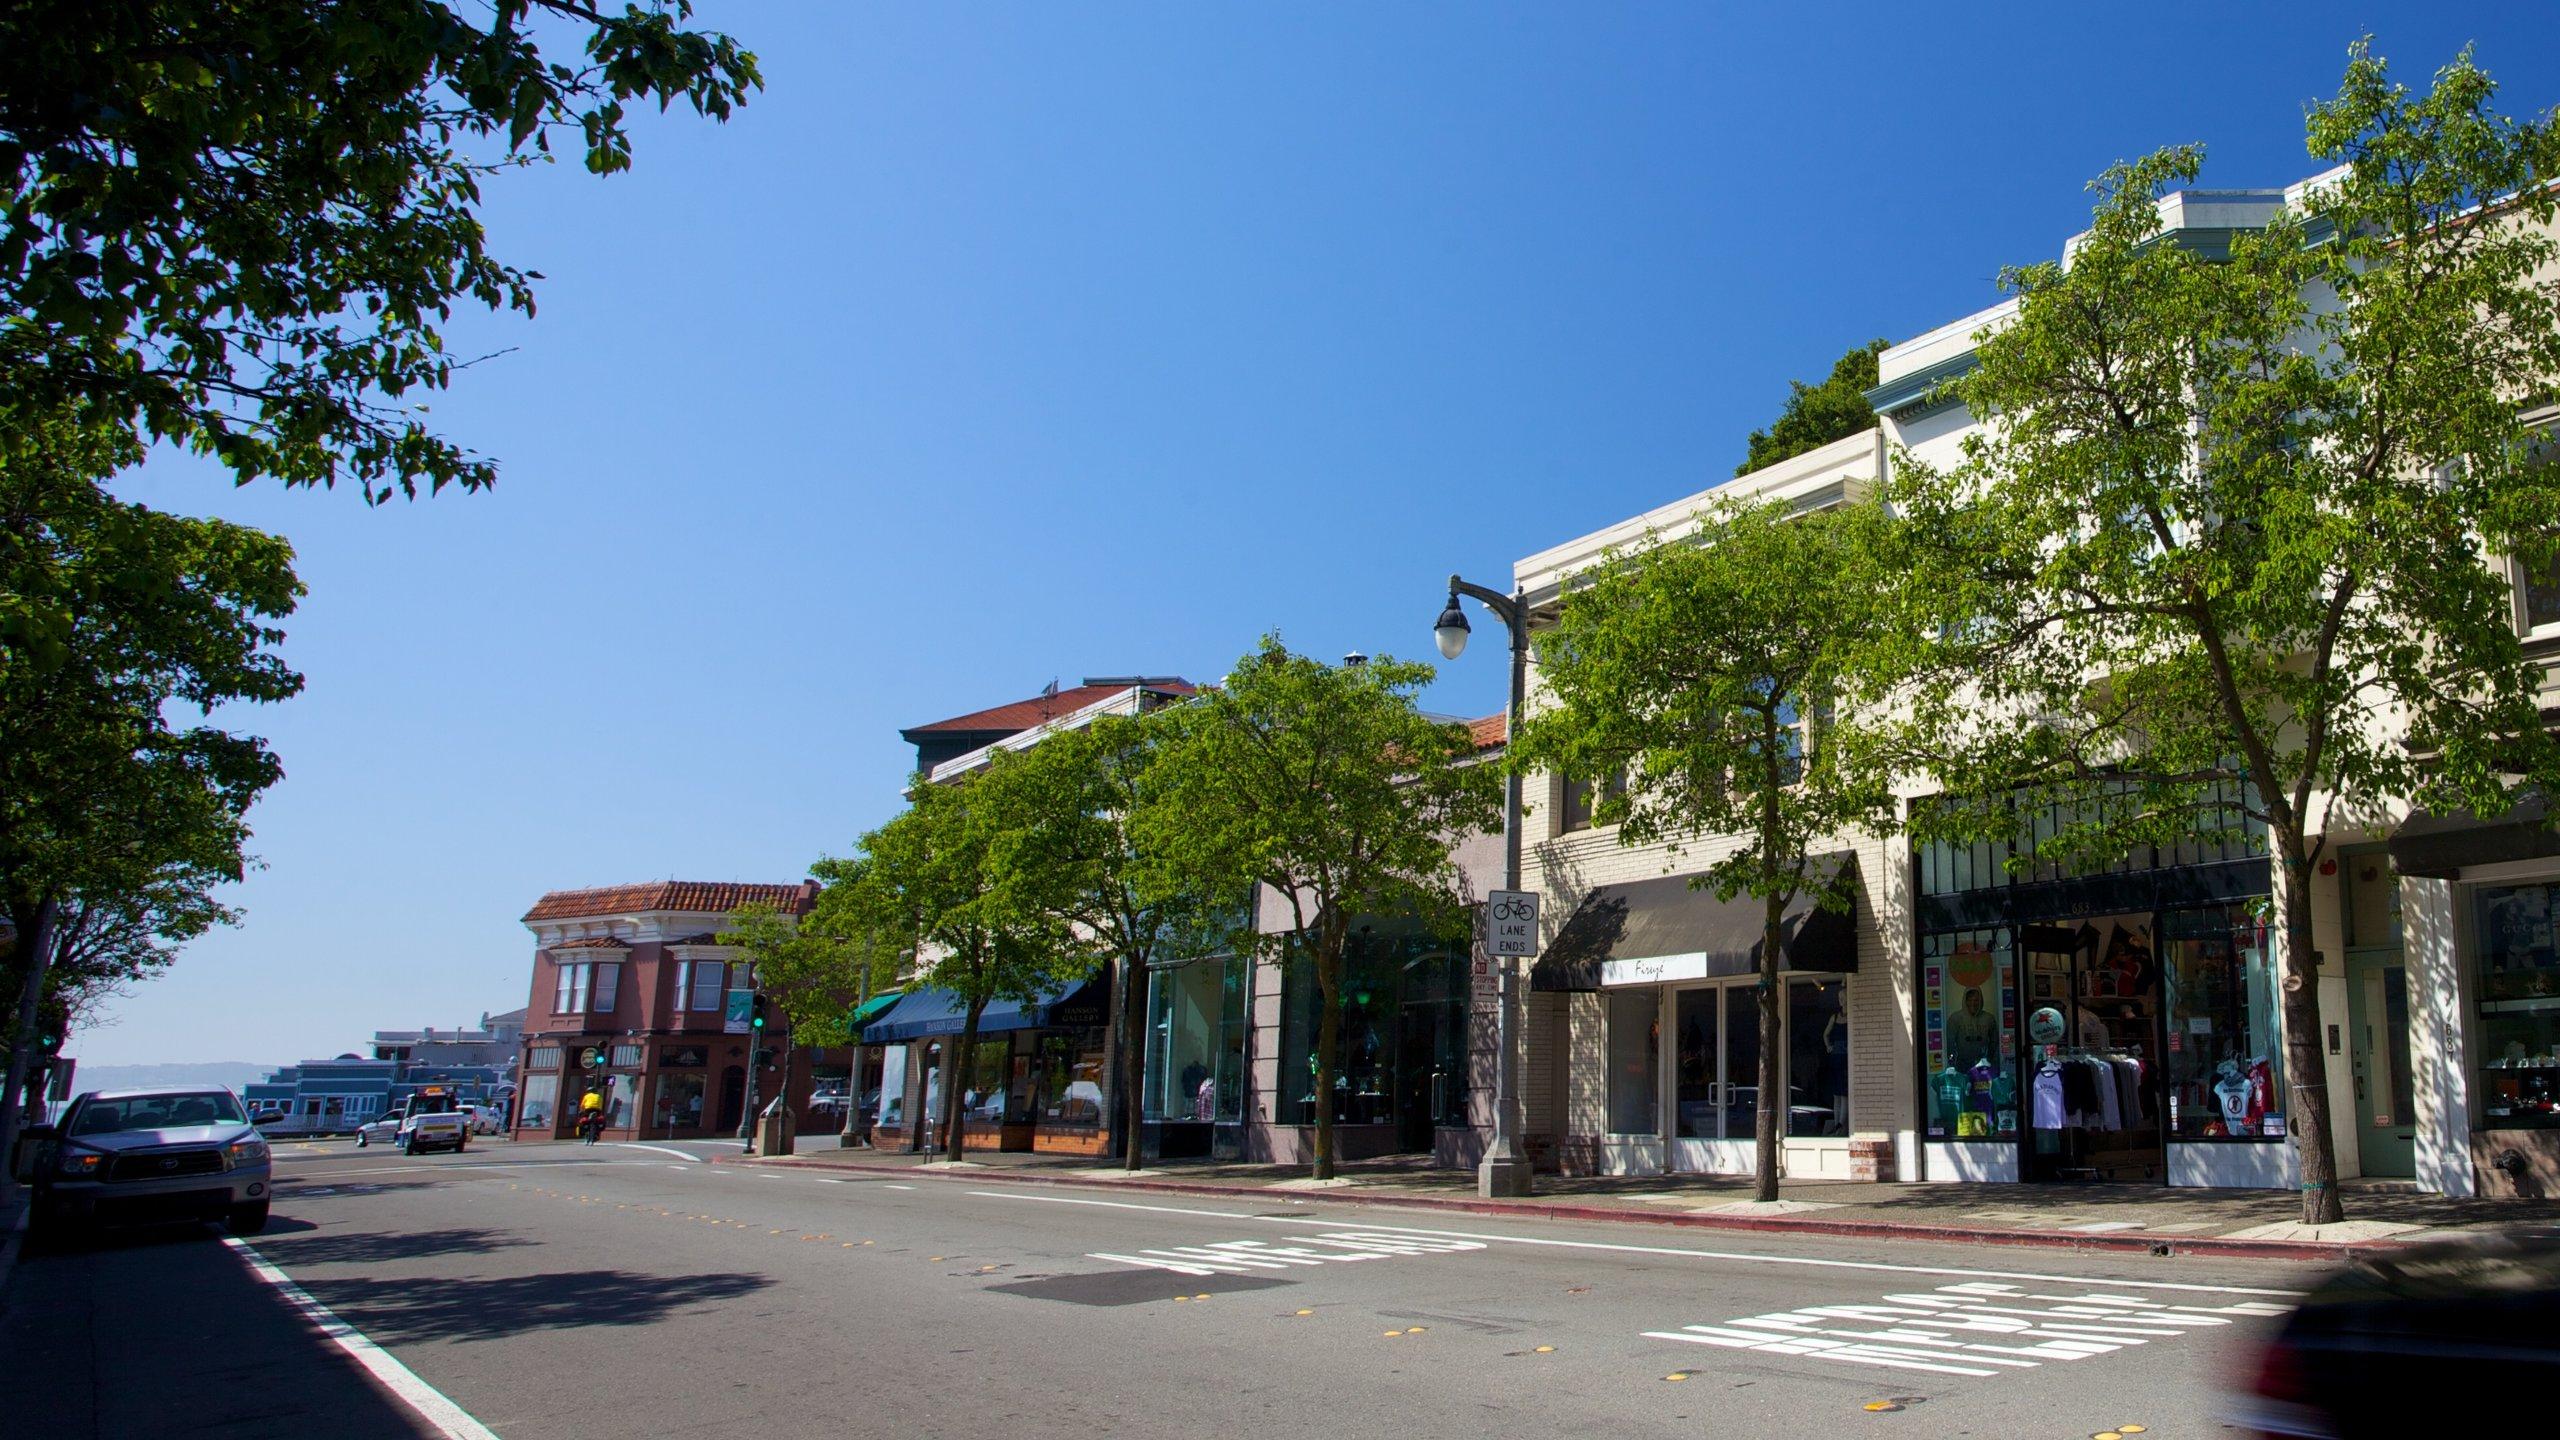 Marin County, California, USA